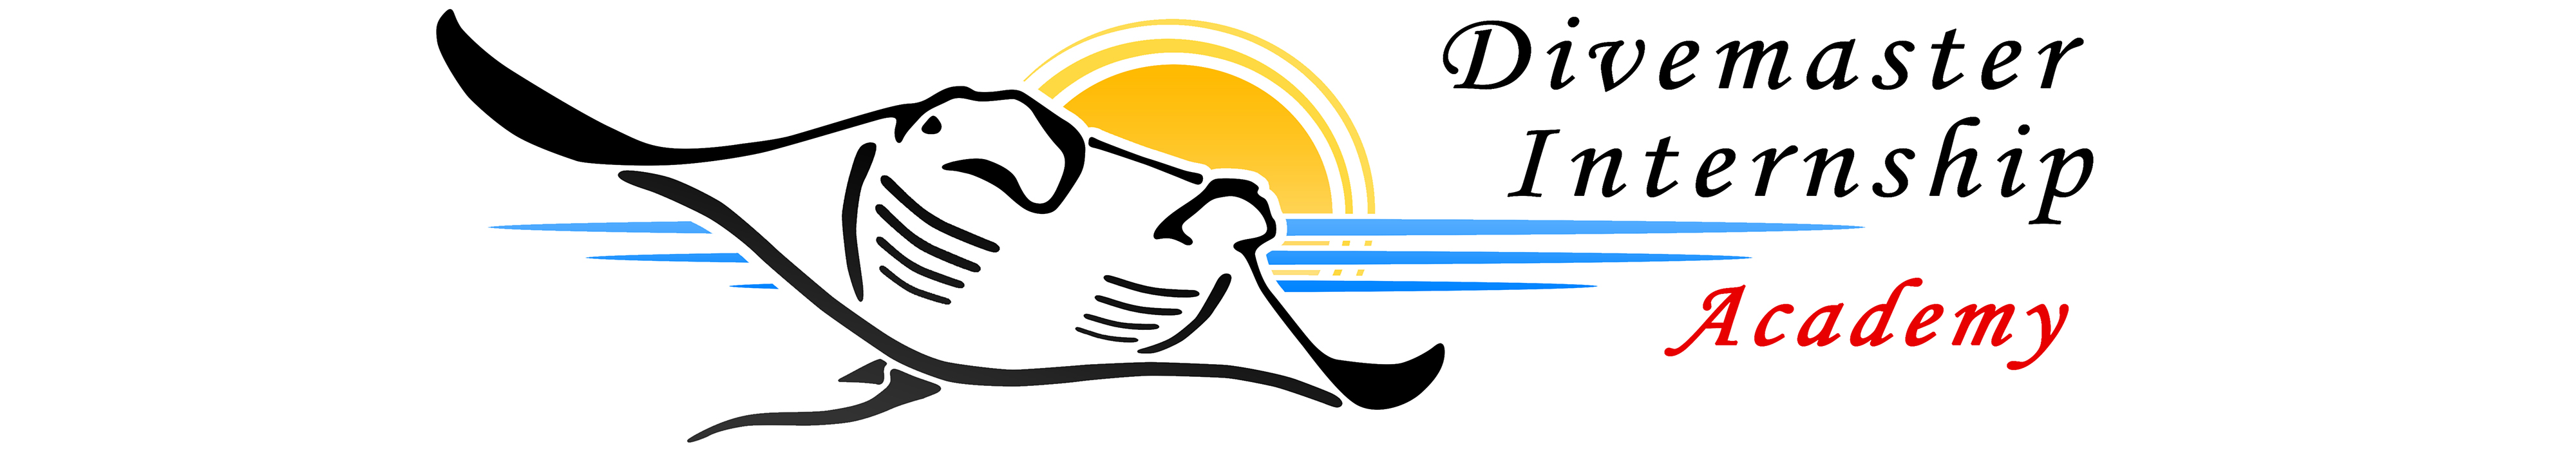 Divemaster internship – PADI Divemaster internships – Dive internships Tenerife